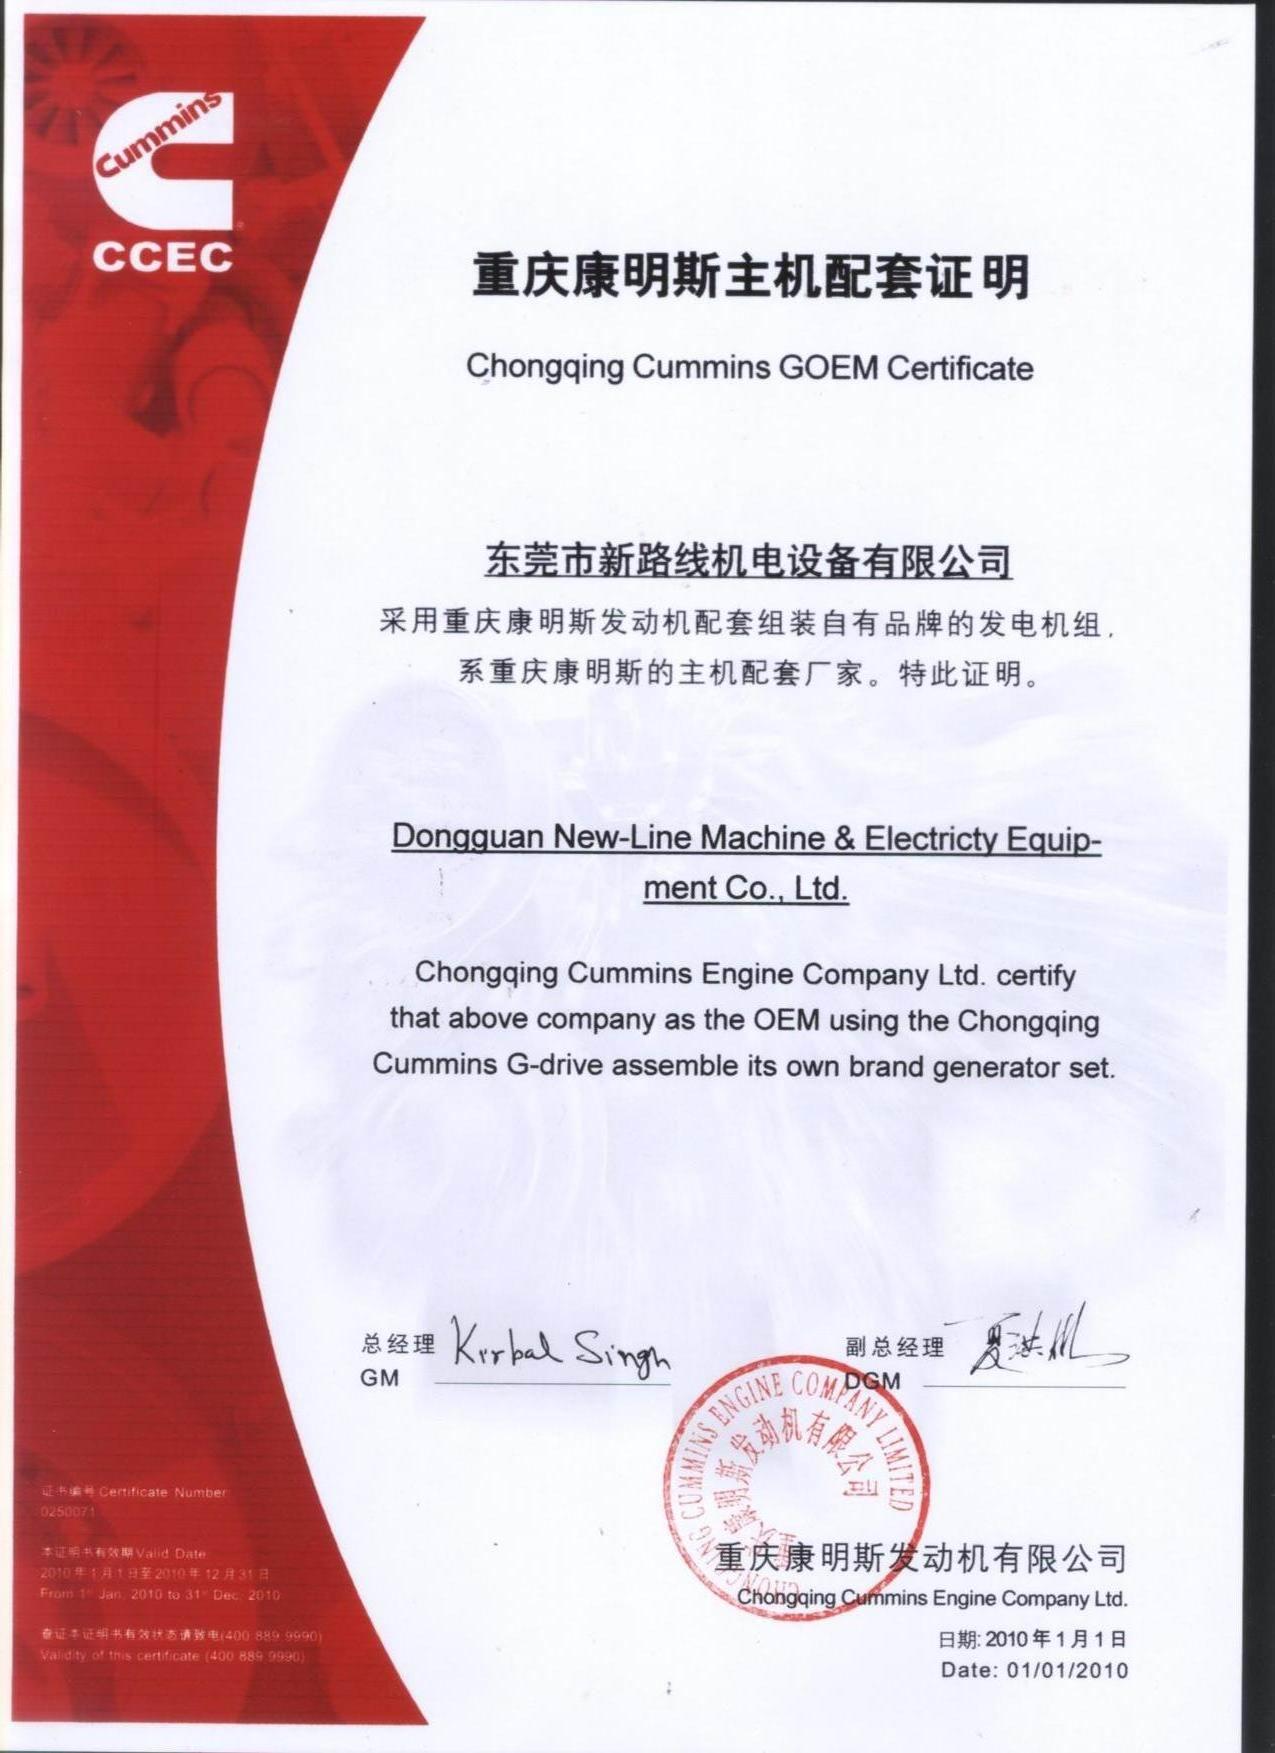 oem certification certified honda ccec